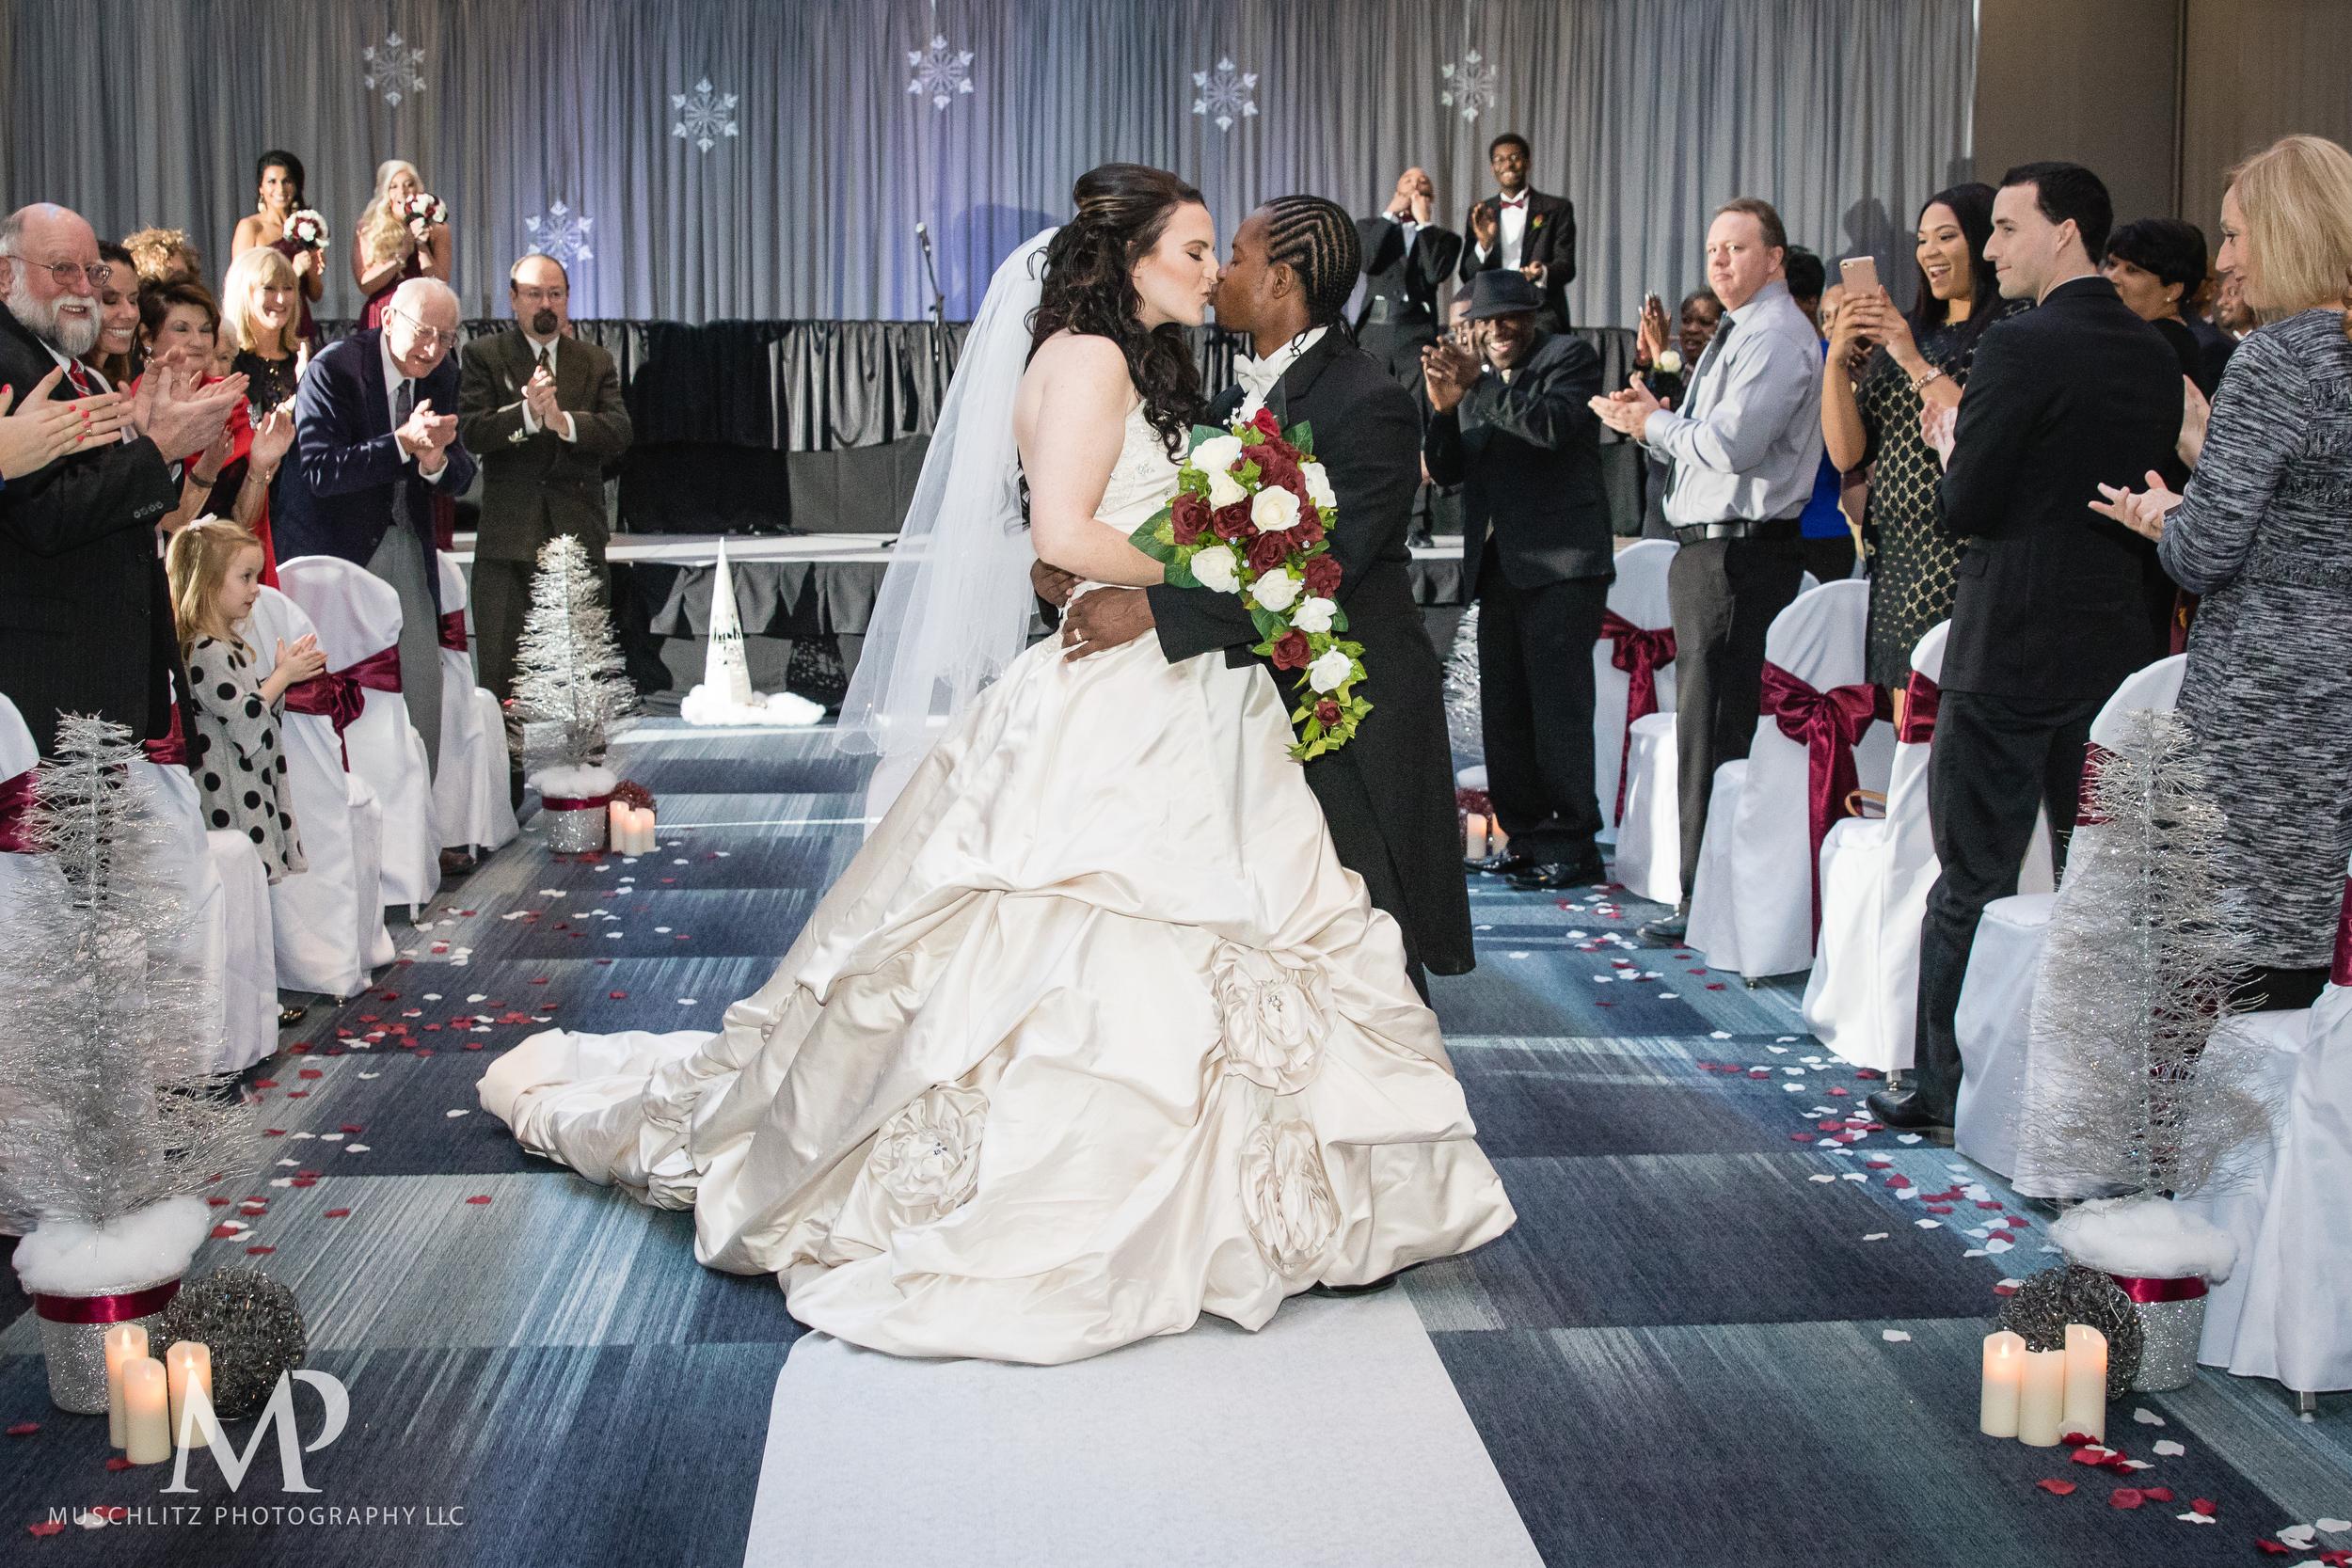 greater-columbus-convention-center-winter-wedding-ceremony-reception-portraits-columbus-ohio-muschlitz-photography-034.JPG